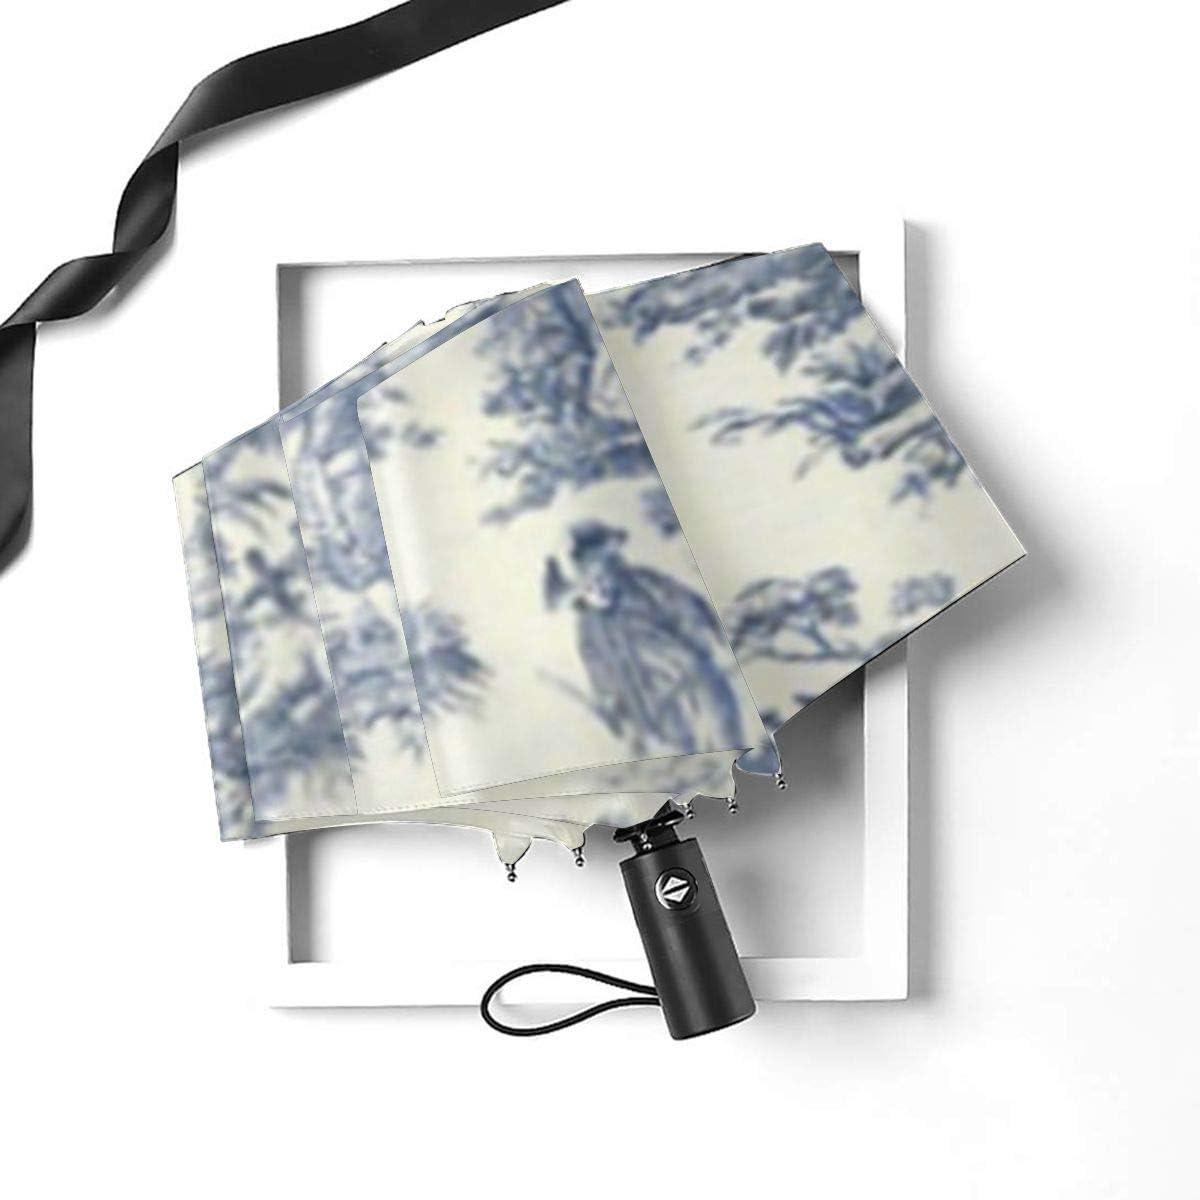 Toile De Jouy Wallpaper Umbrella Compact Rain/&Wind Repellent Umbrellas Sun Protection With Anti UV Coating Travel Auto Folding Umbrella